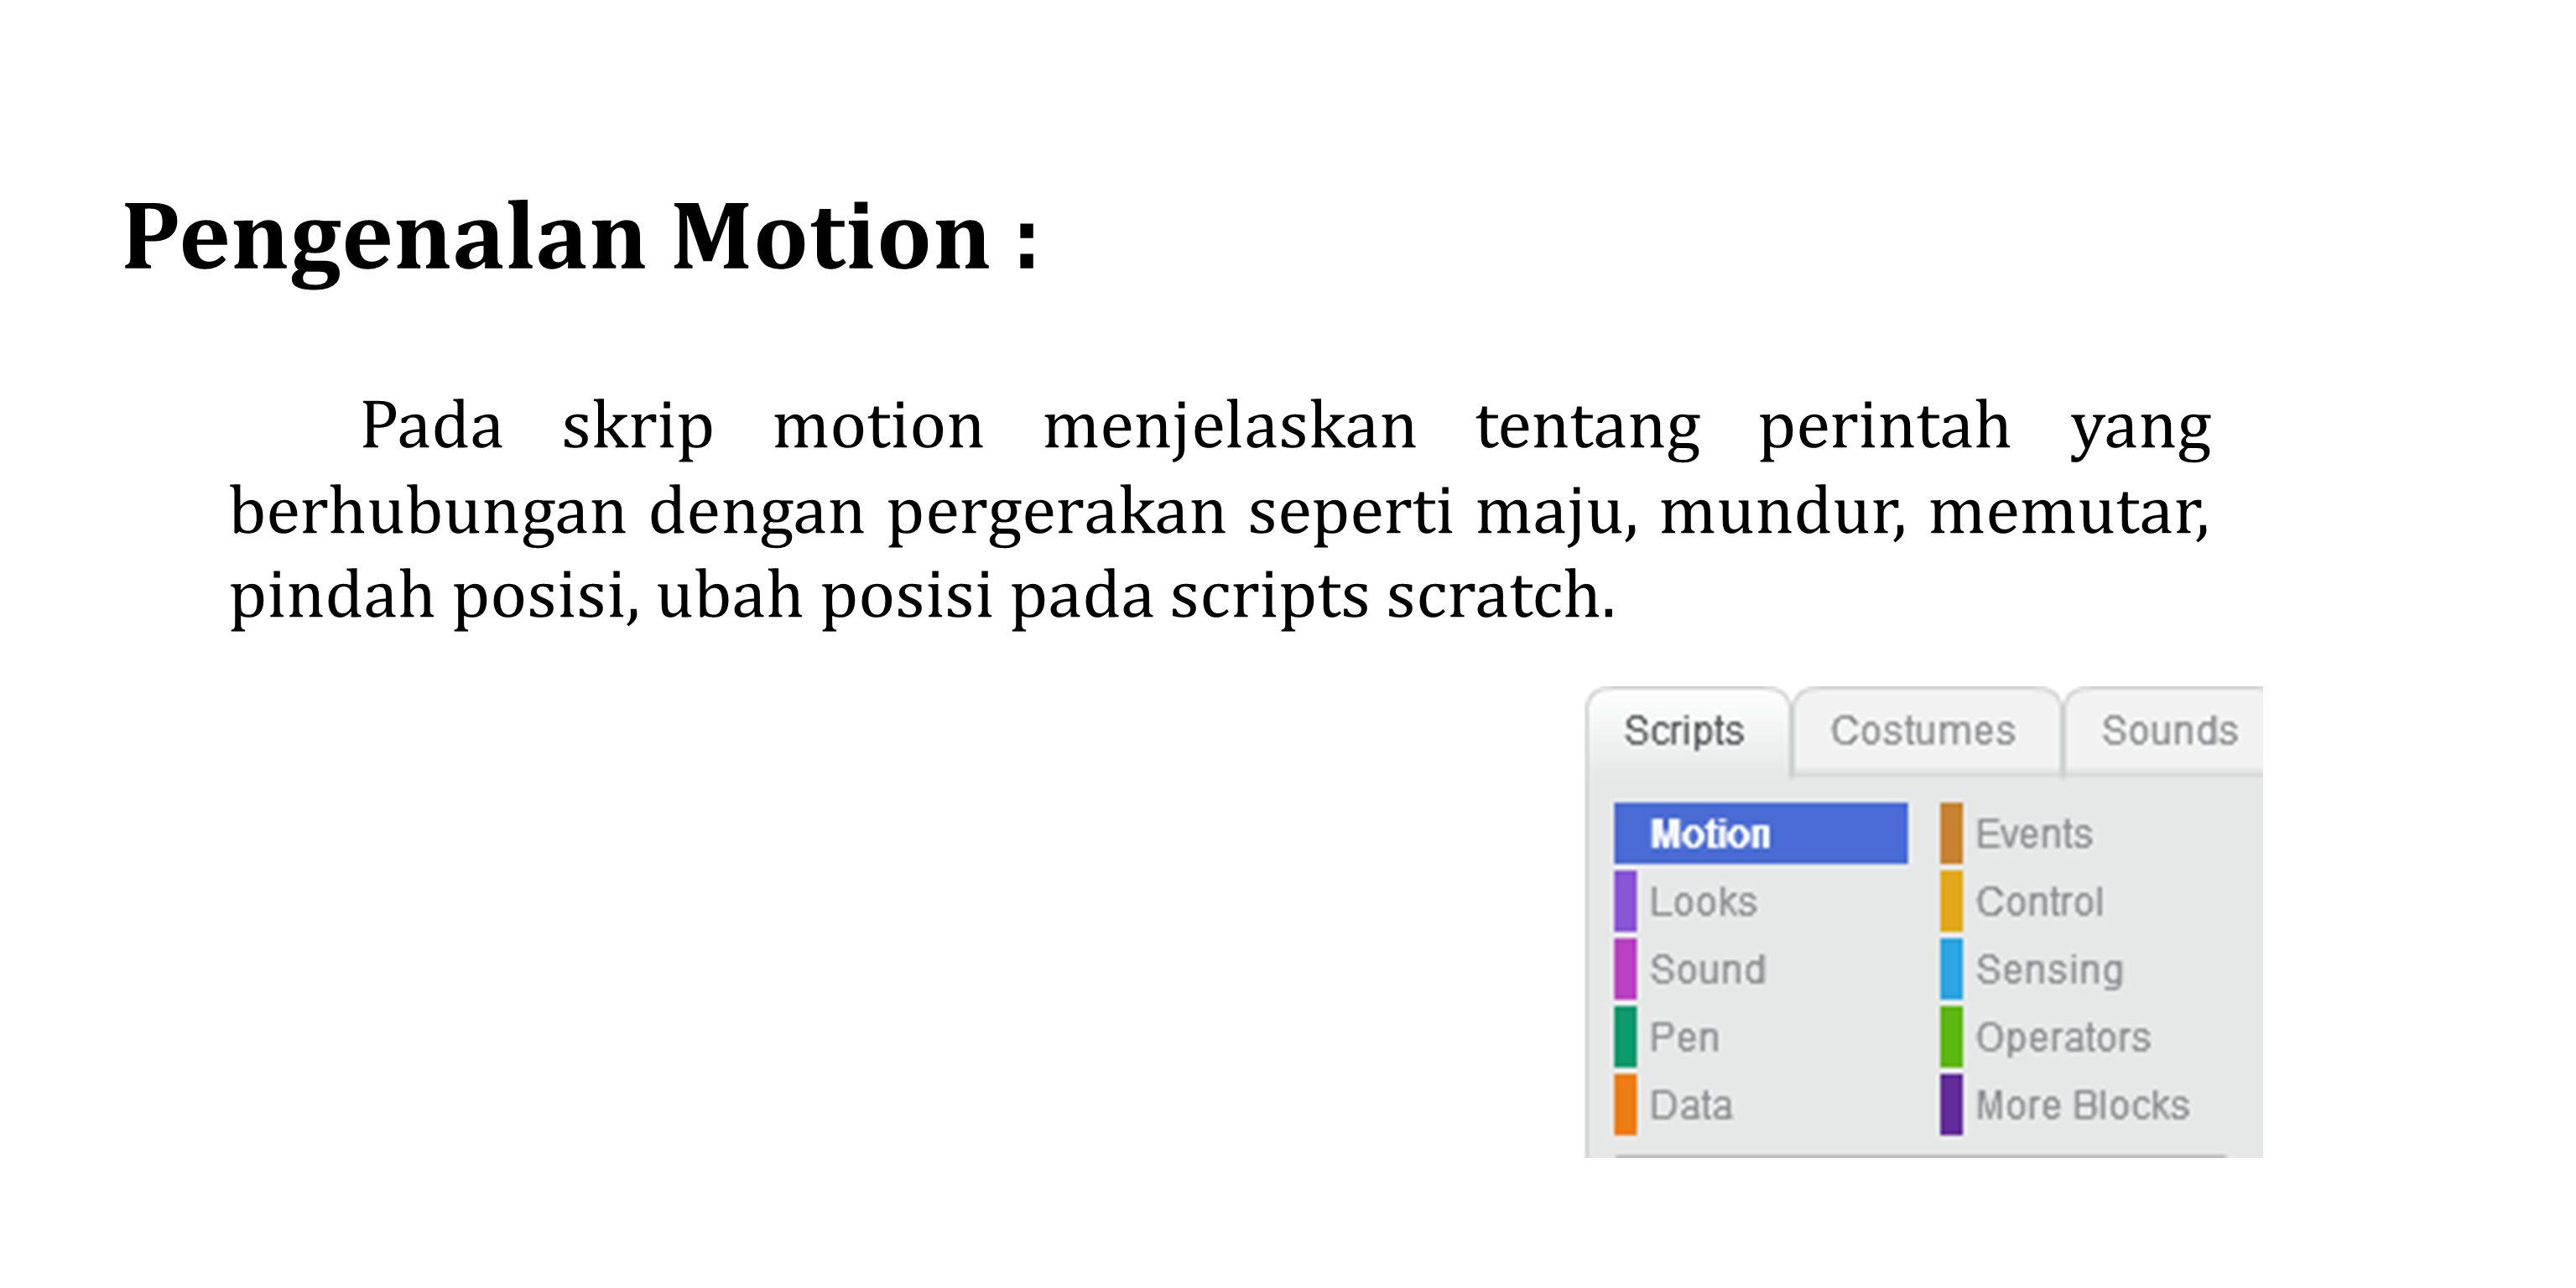 Pengenalan Motion : Pada skrip motion menjelaskan tentang perintah yang berhubungan dengan pergerakan seperti maju, mundur, memutar, pindah posisi, ub